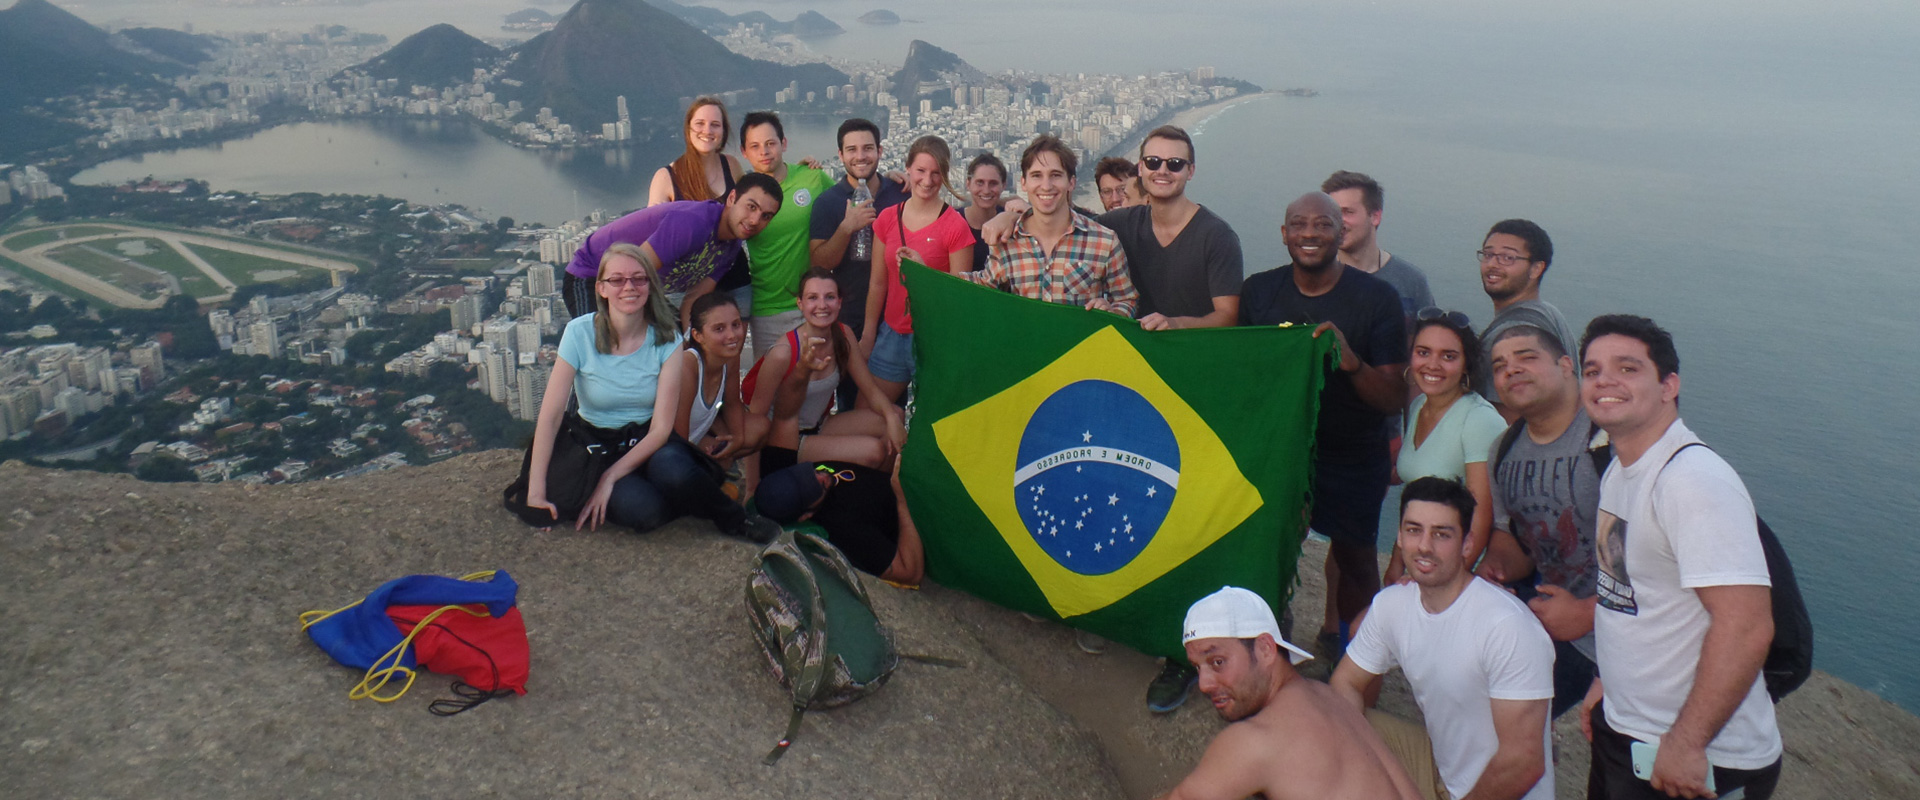 Explore Rio de Janeiro and Visit Morro Dois Irmãos with Rio & Learn Portuguese School.